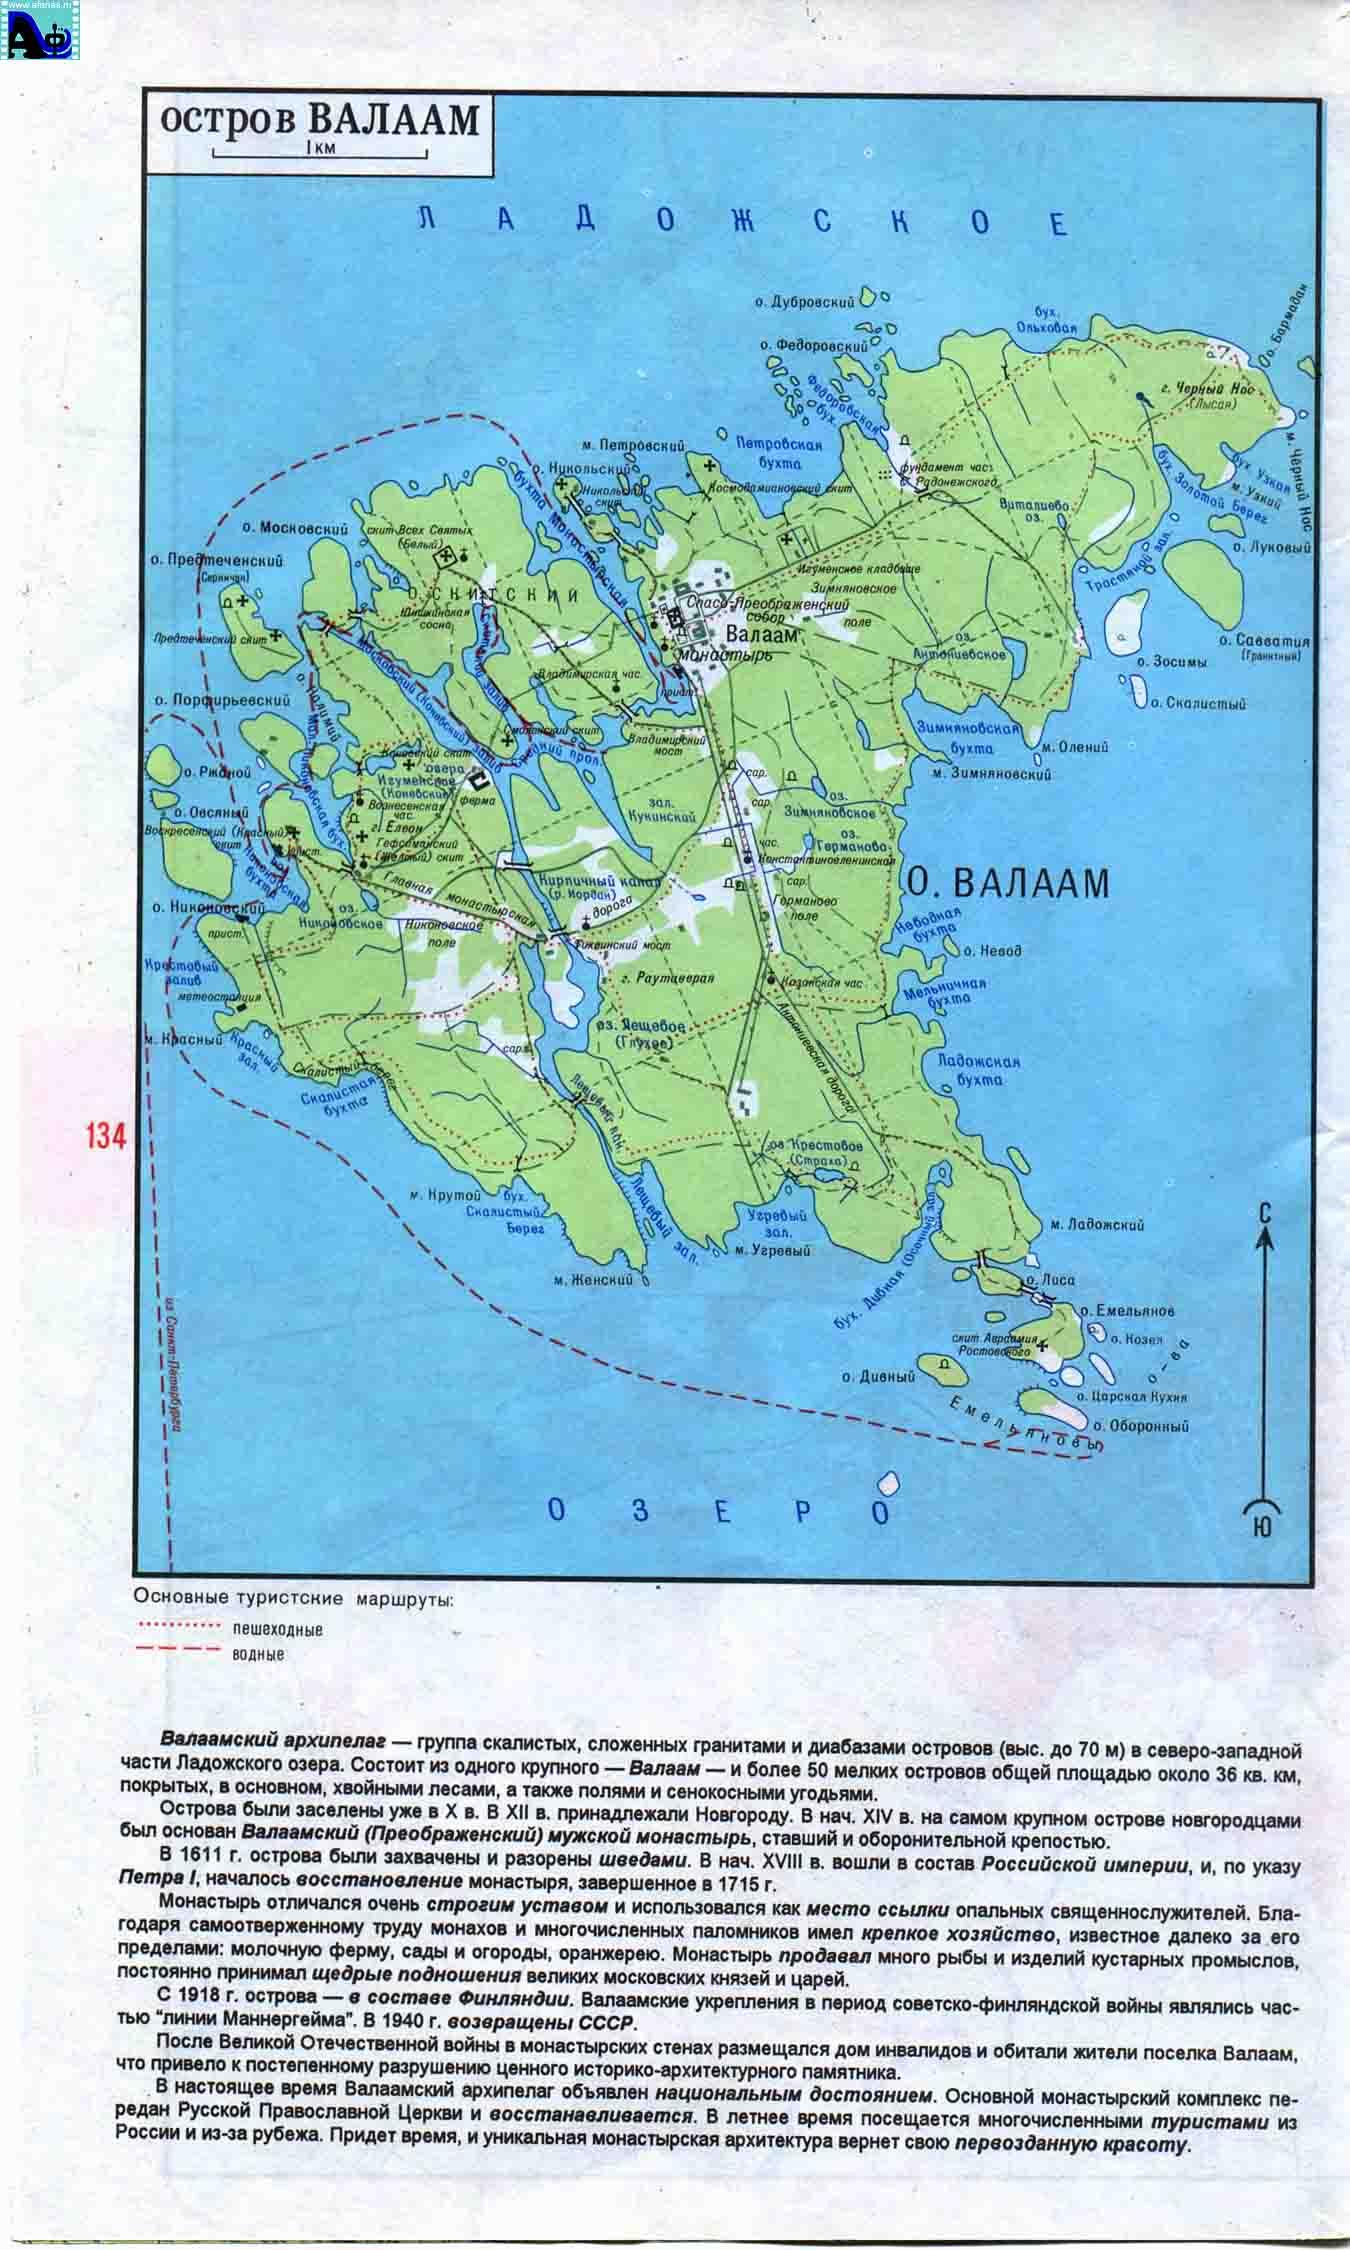 http://www.afanas.ru/maps/karjpg/kar134.jpg